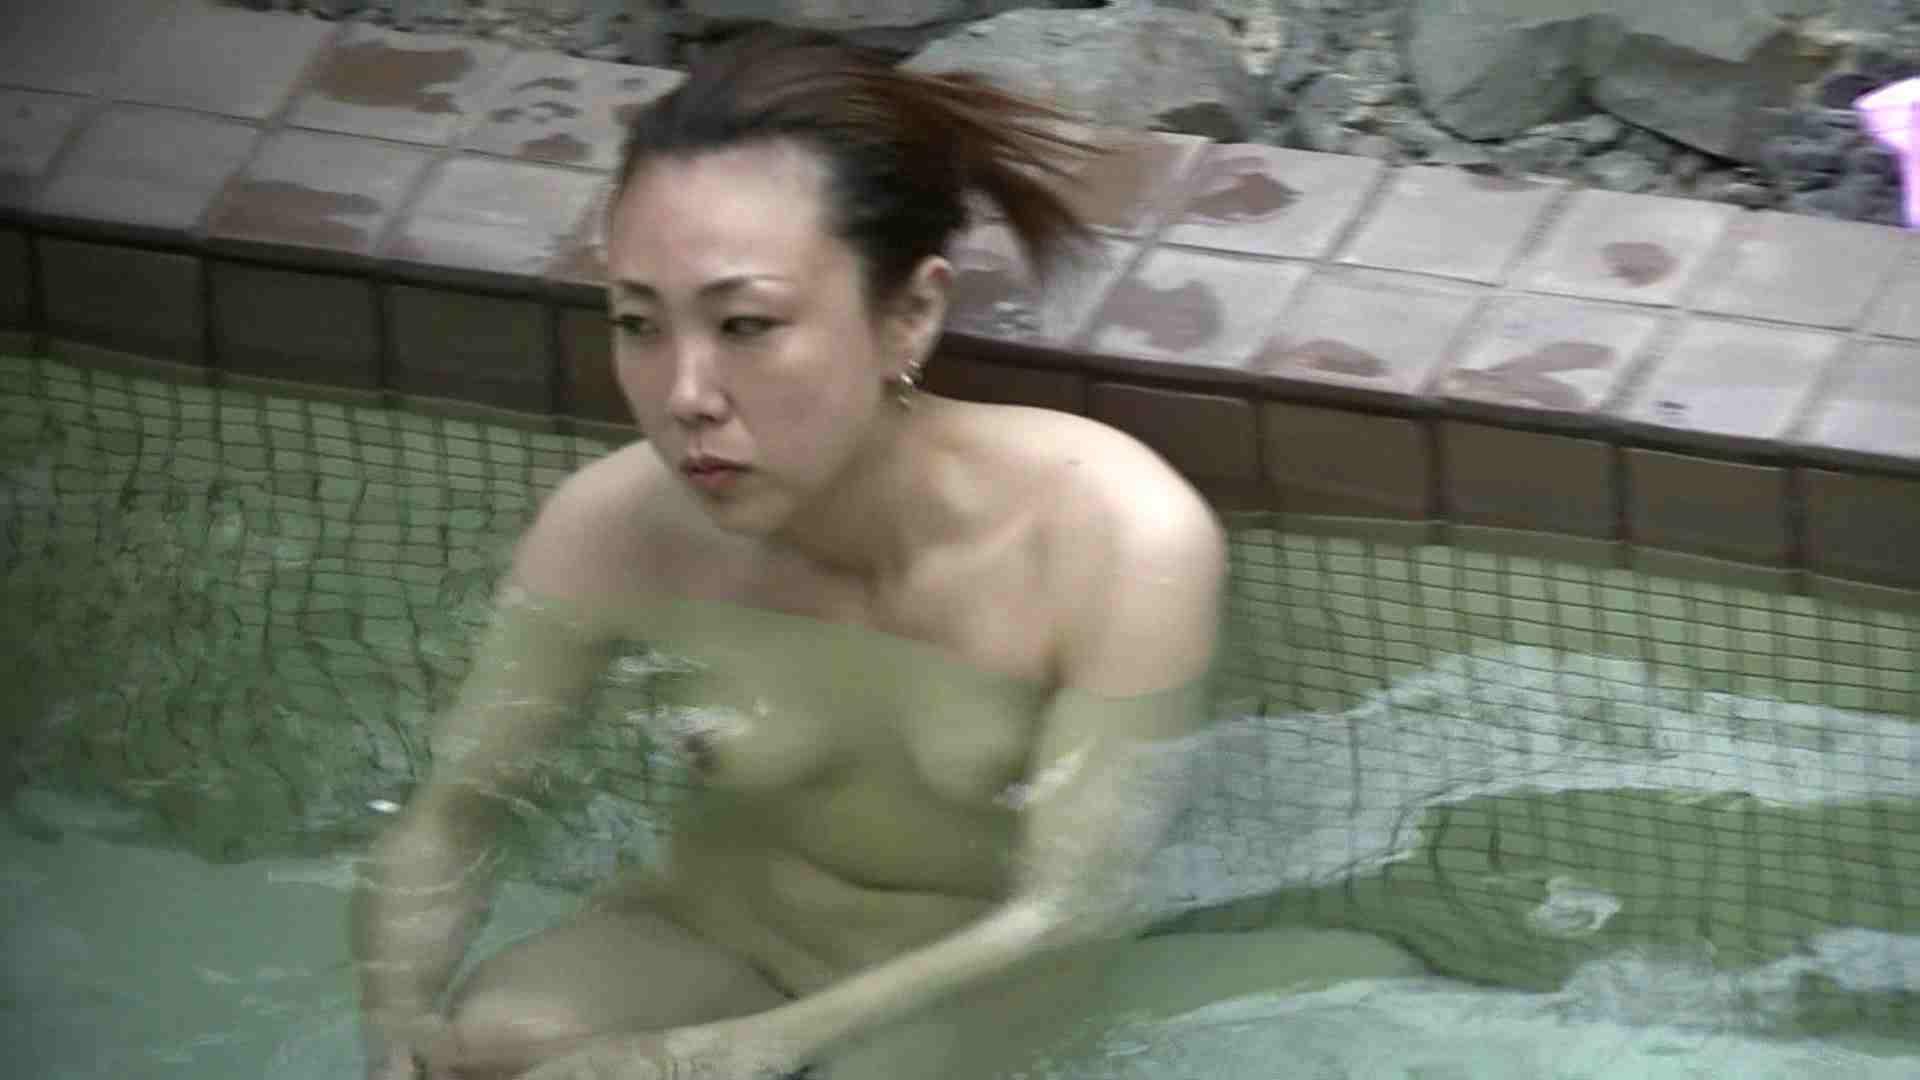 Aquaな露天風呂Vol.654 女体盗撮   OL女体  87連発 73